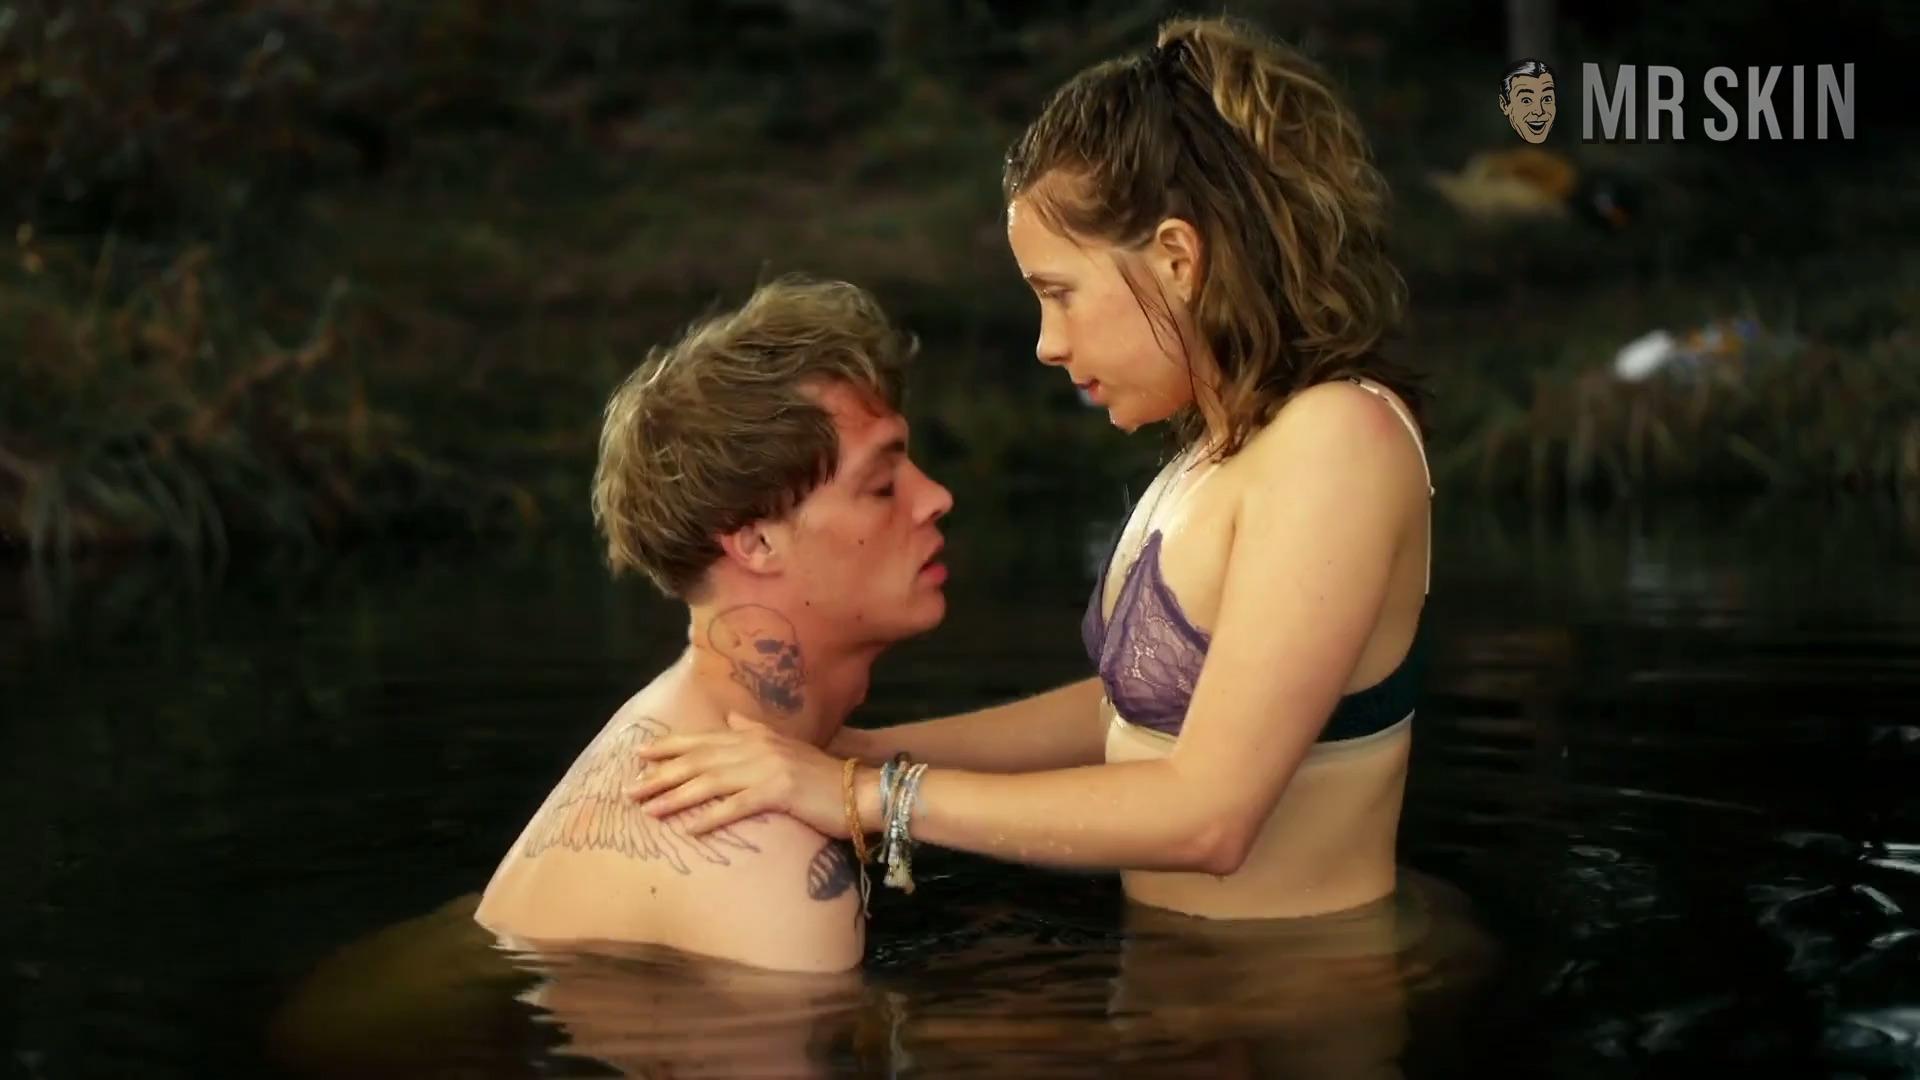 Alyssa Milano Nua lena klenke nude - naked pics and sex scenes at mr. skin